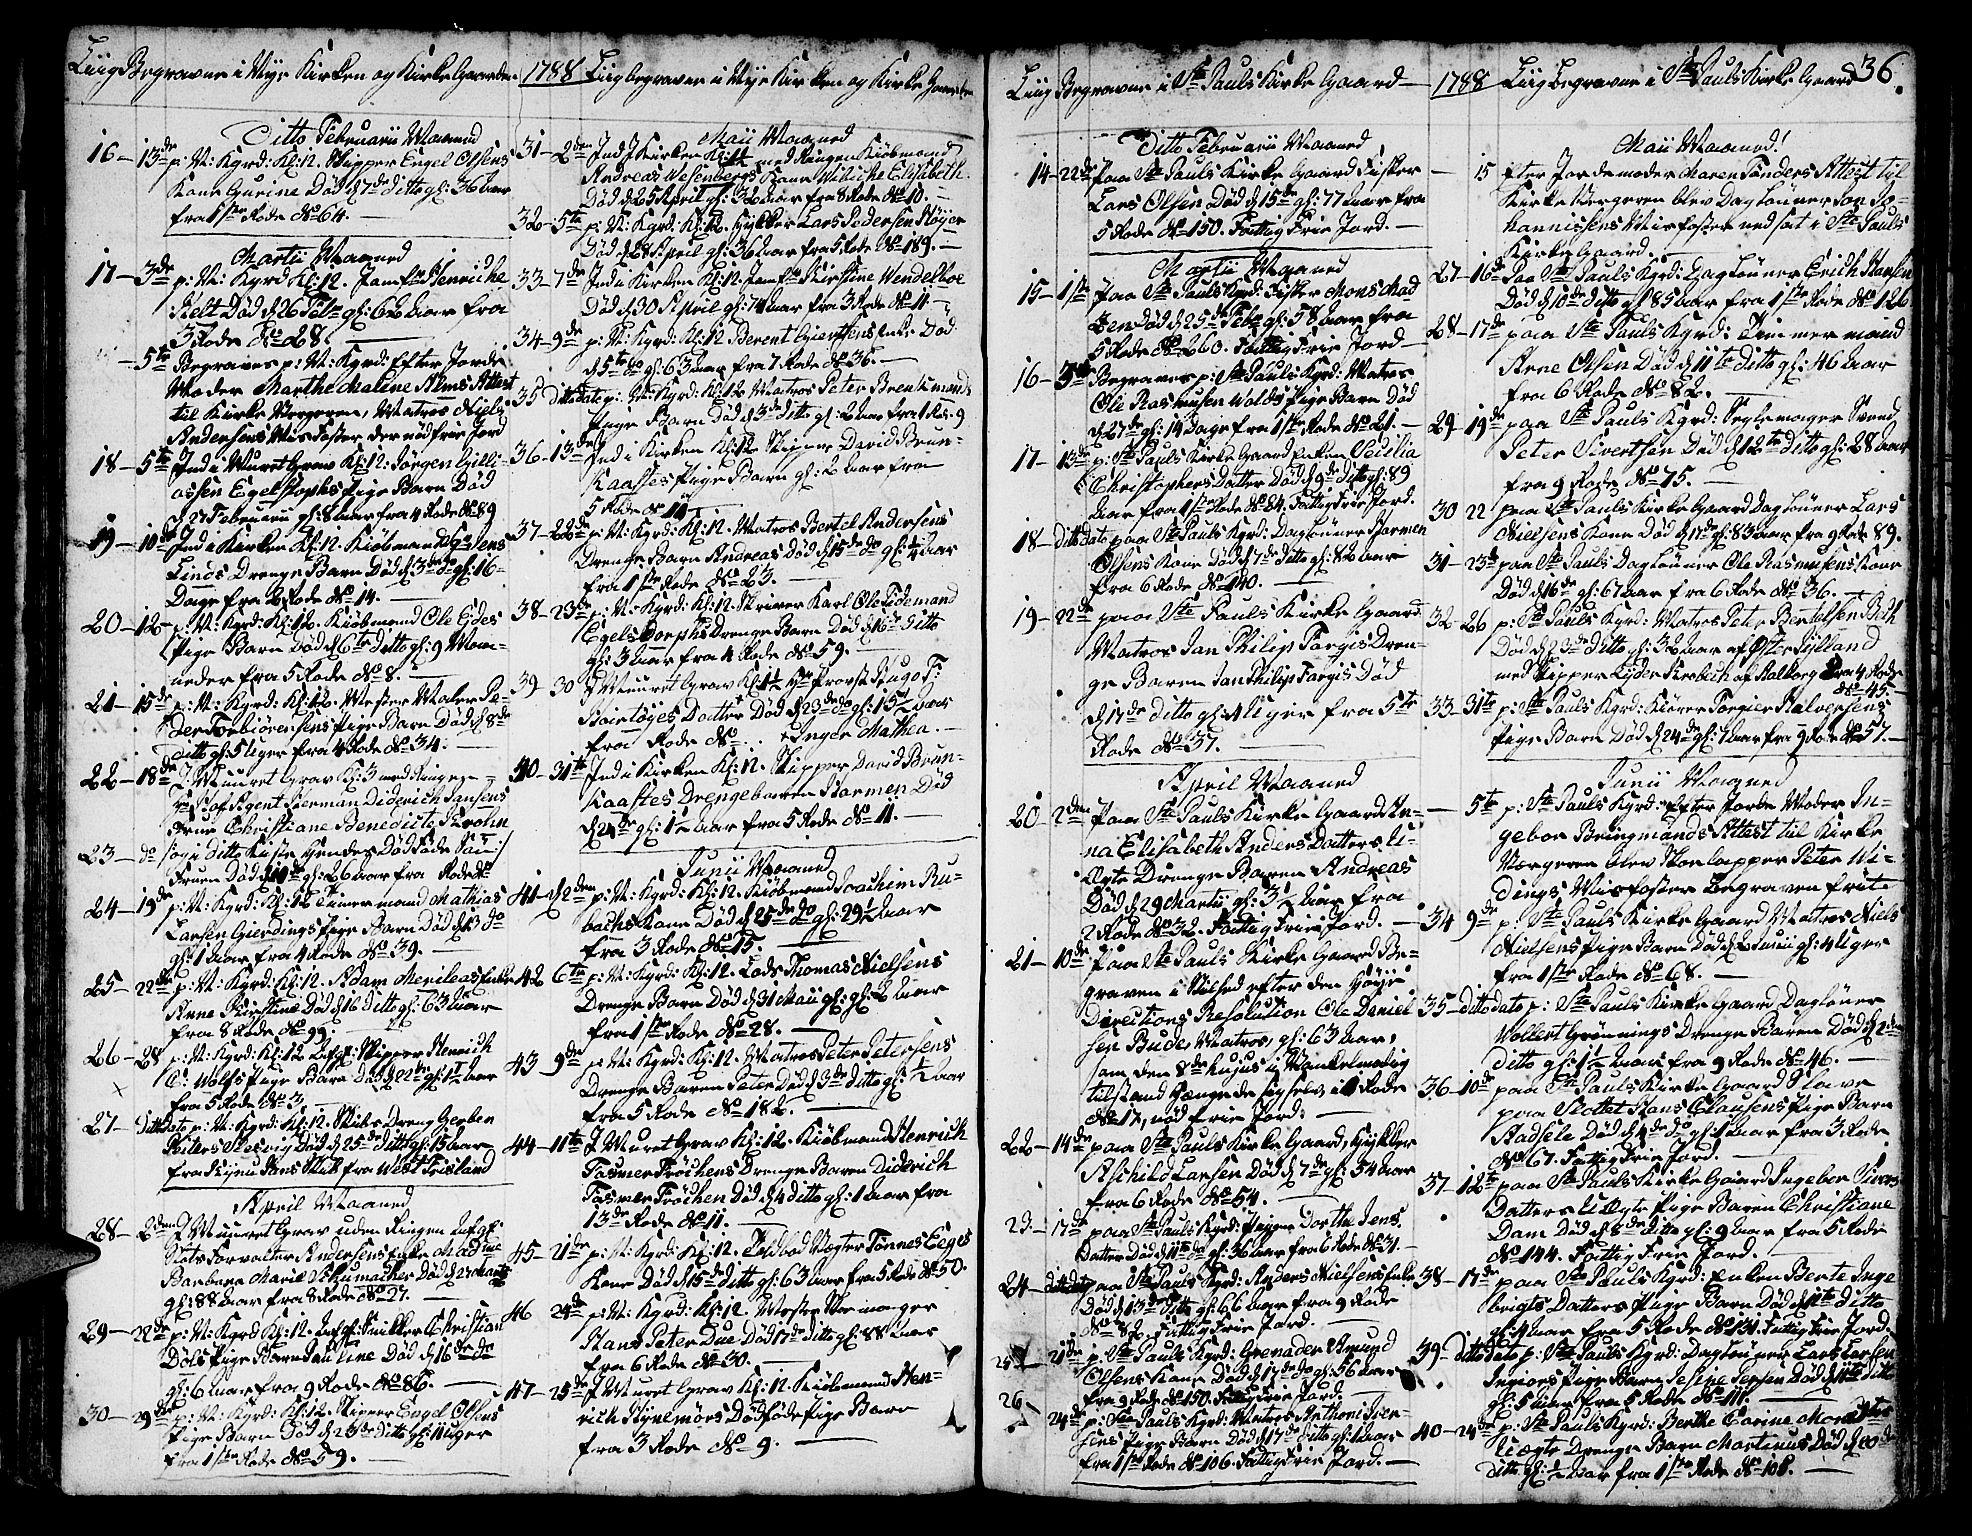 SAB, Nykirken Sokneprestembete, H/Hab: Klokkerbok nr. A 3, 1775-1820, s. 36